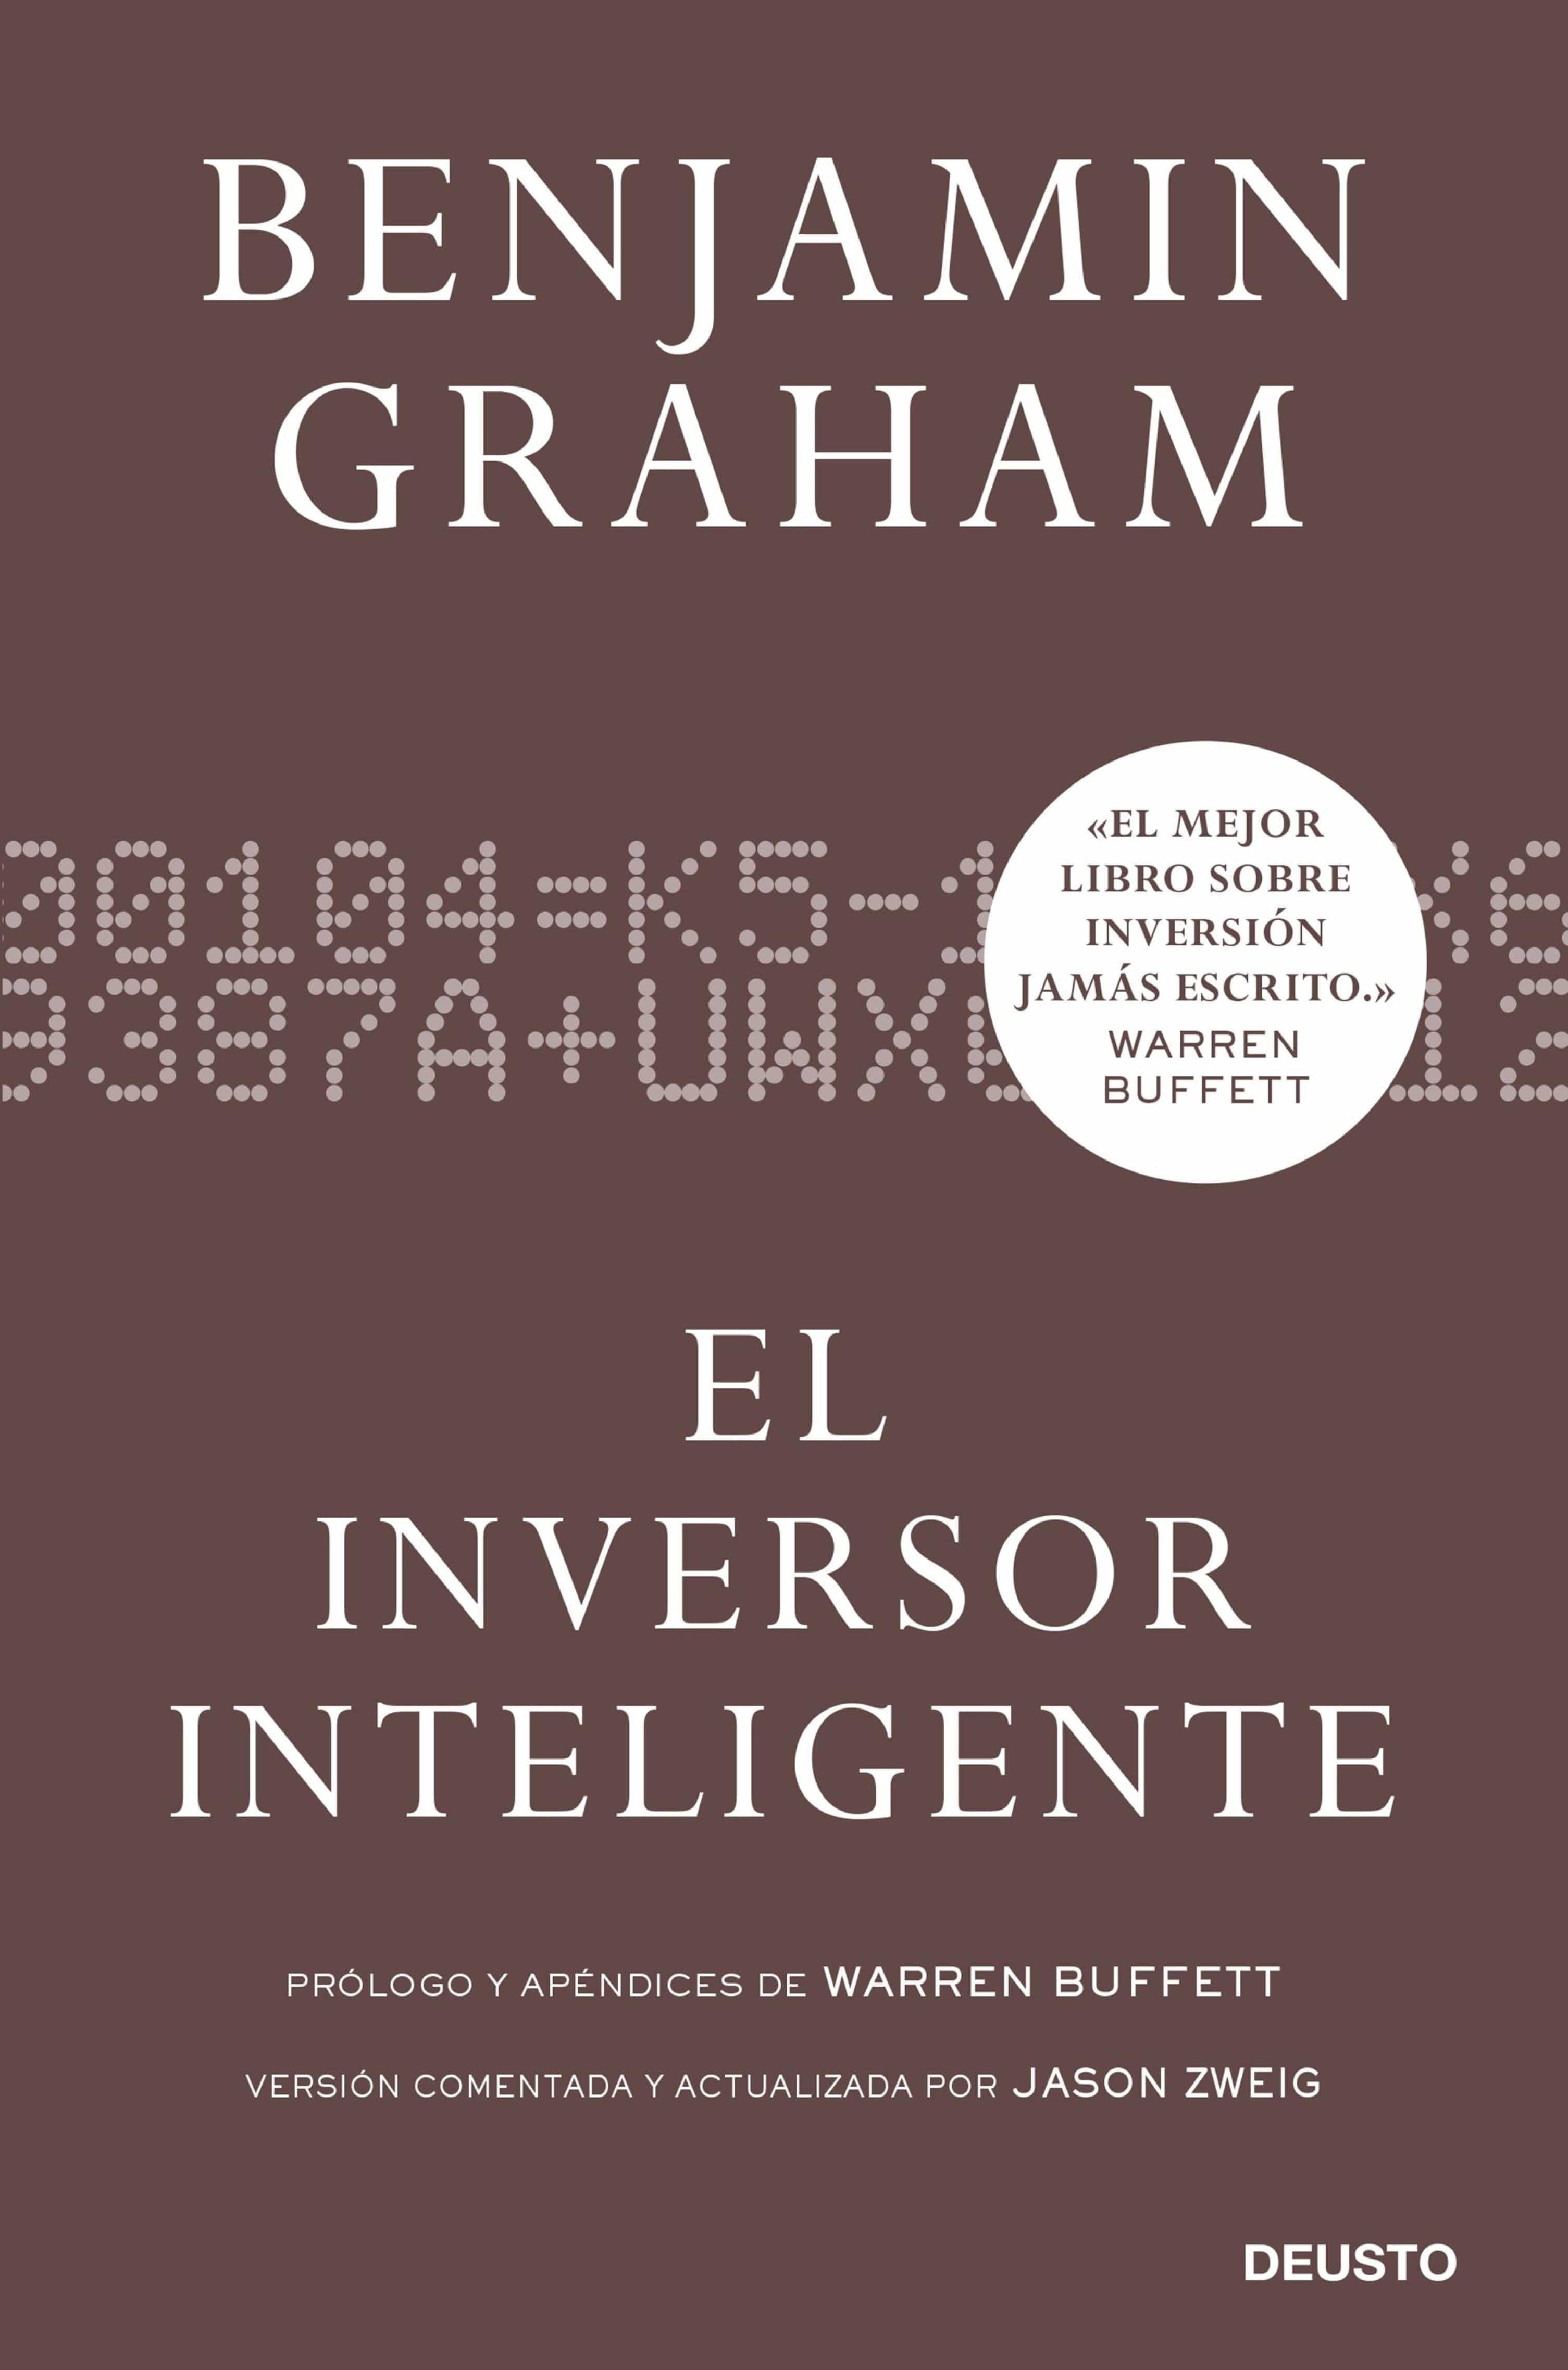 El inversor inteligente ebook benjamin graham 9788423413027